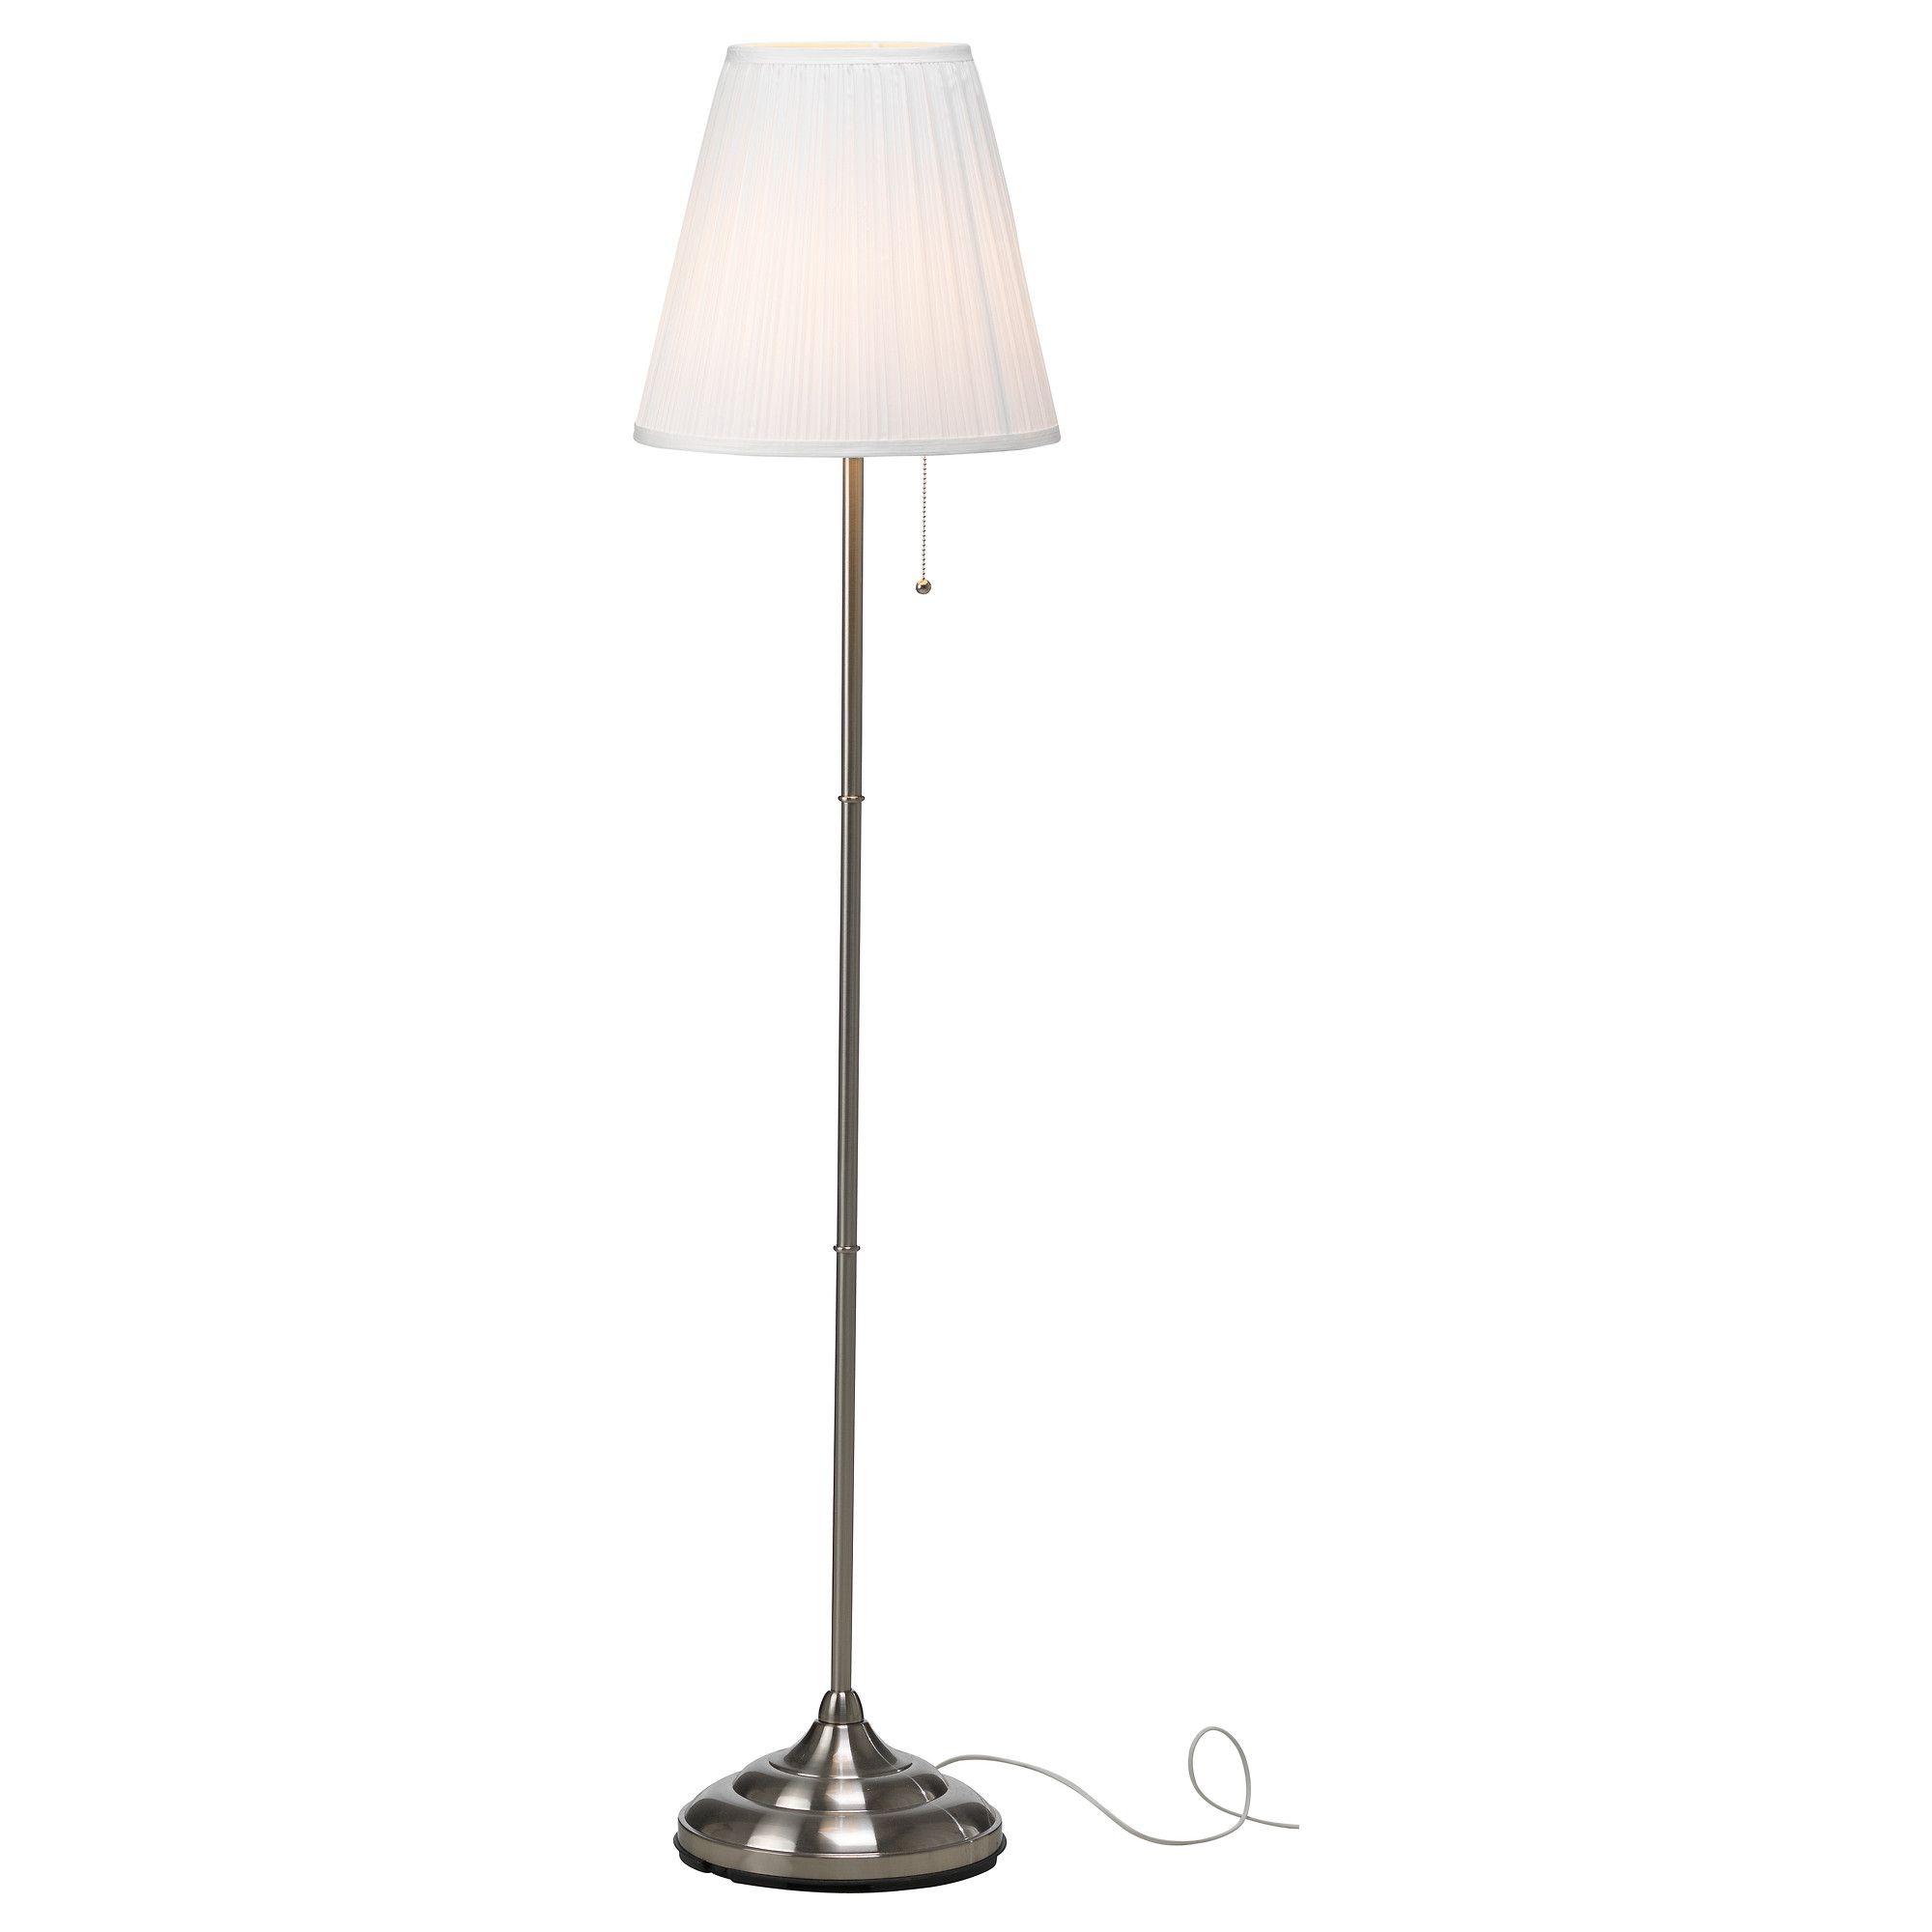 Us Furniture And Home Furnishings Vloerlamp Lampen Hoge Lampen